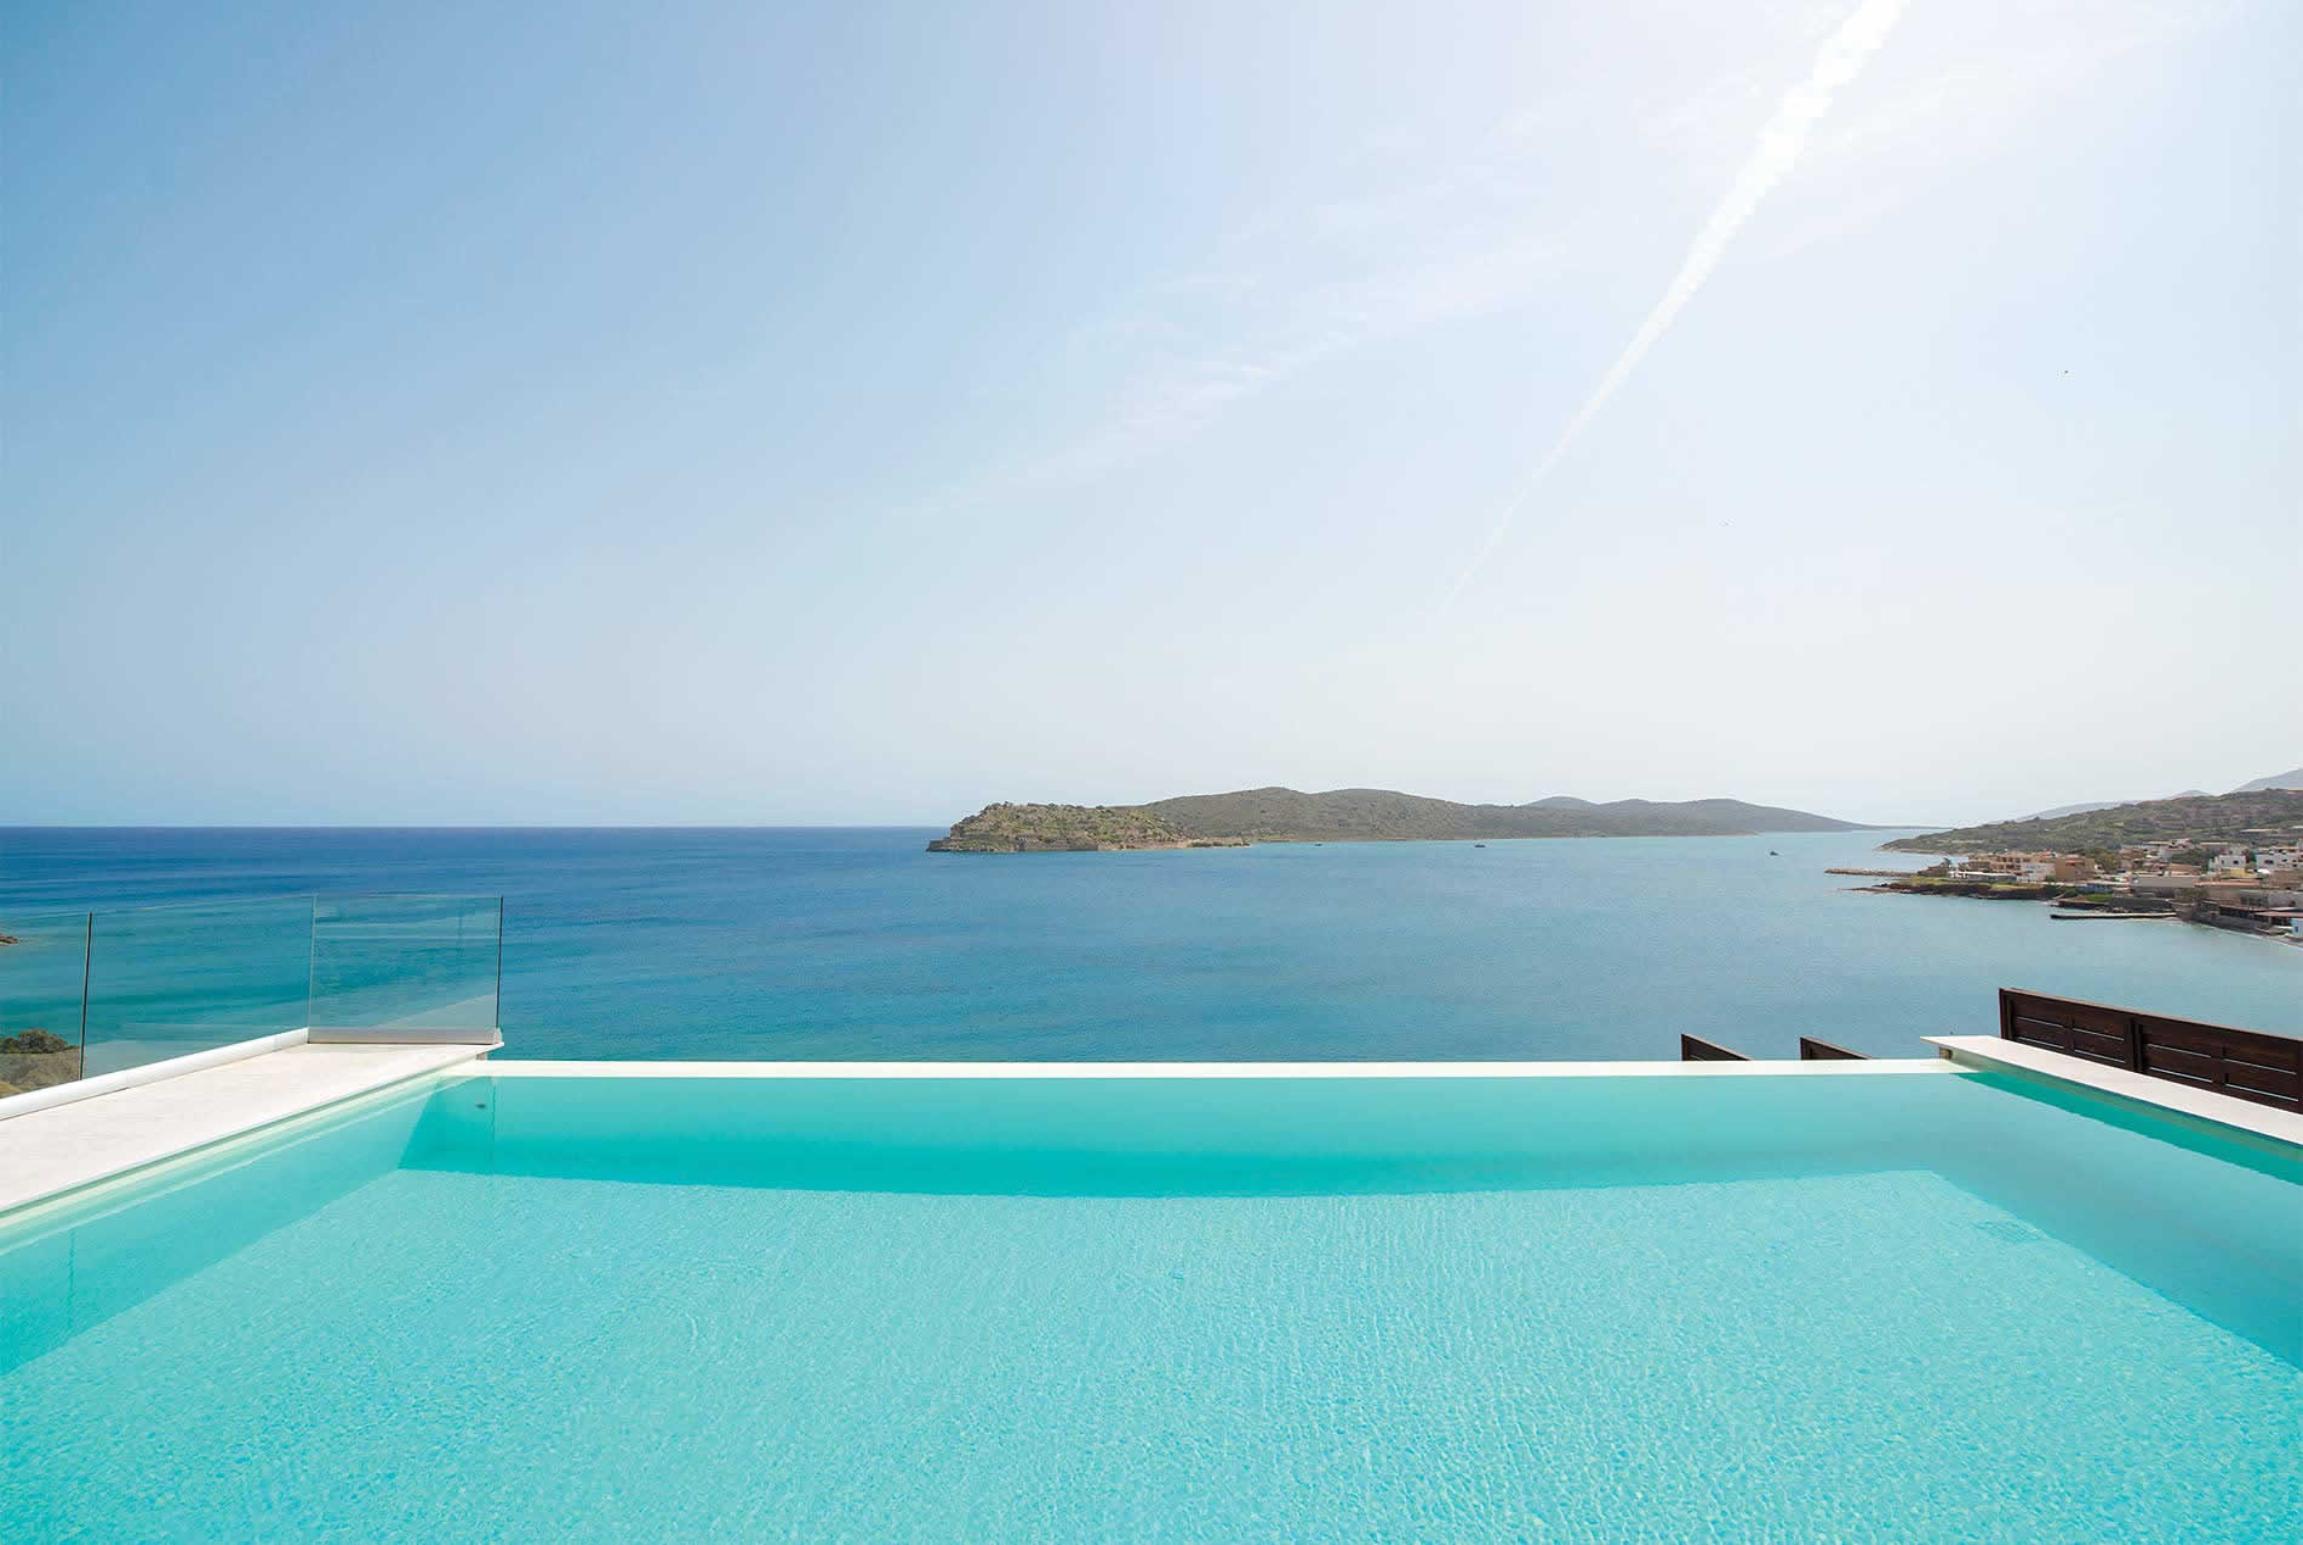 Ferienhaus Danae (2654195), Plaka, Kreta Nordküste, Kreta, Griechenland, Bild 16